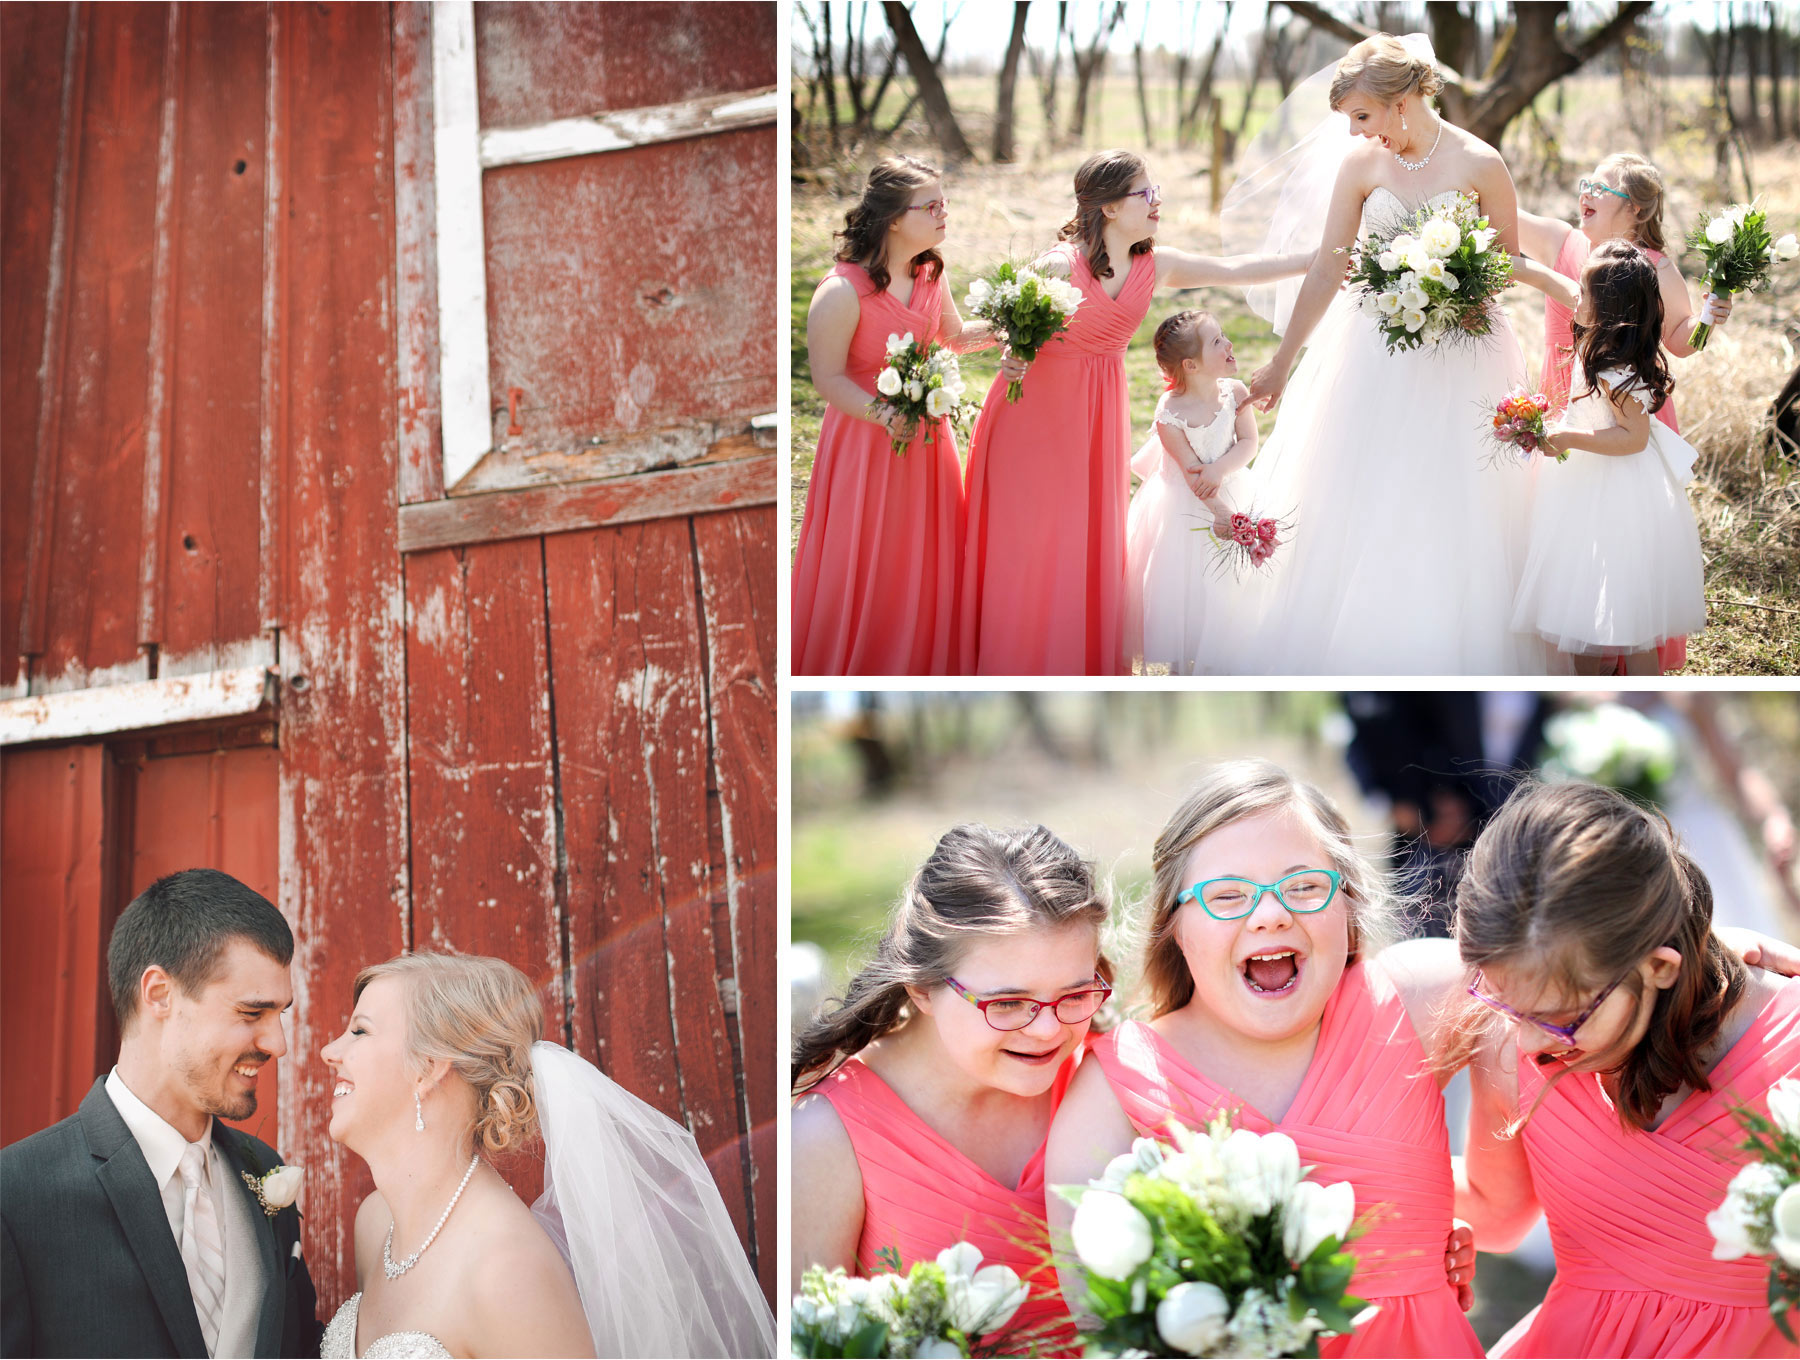 06-Minneapolis-Wedding-Photography-by-Vick-Photography-Flower-Girls-Kasie-and-Joshua.jpg